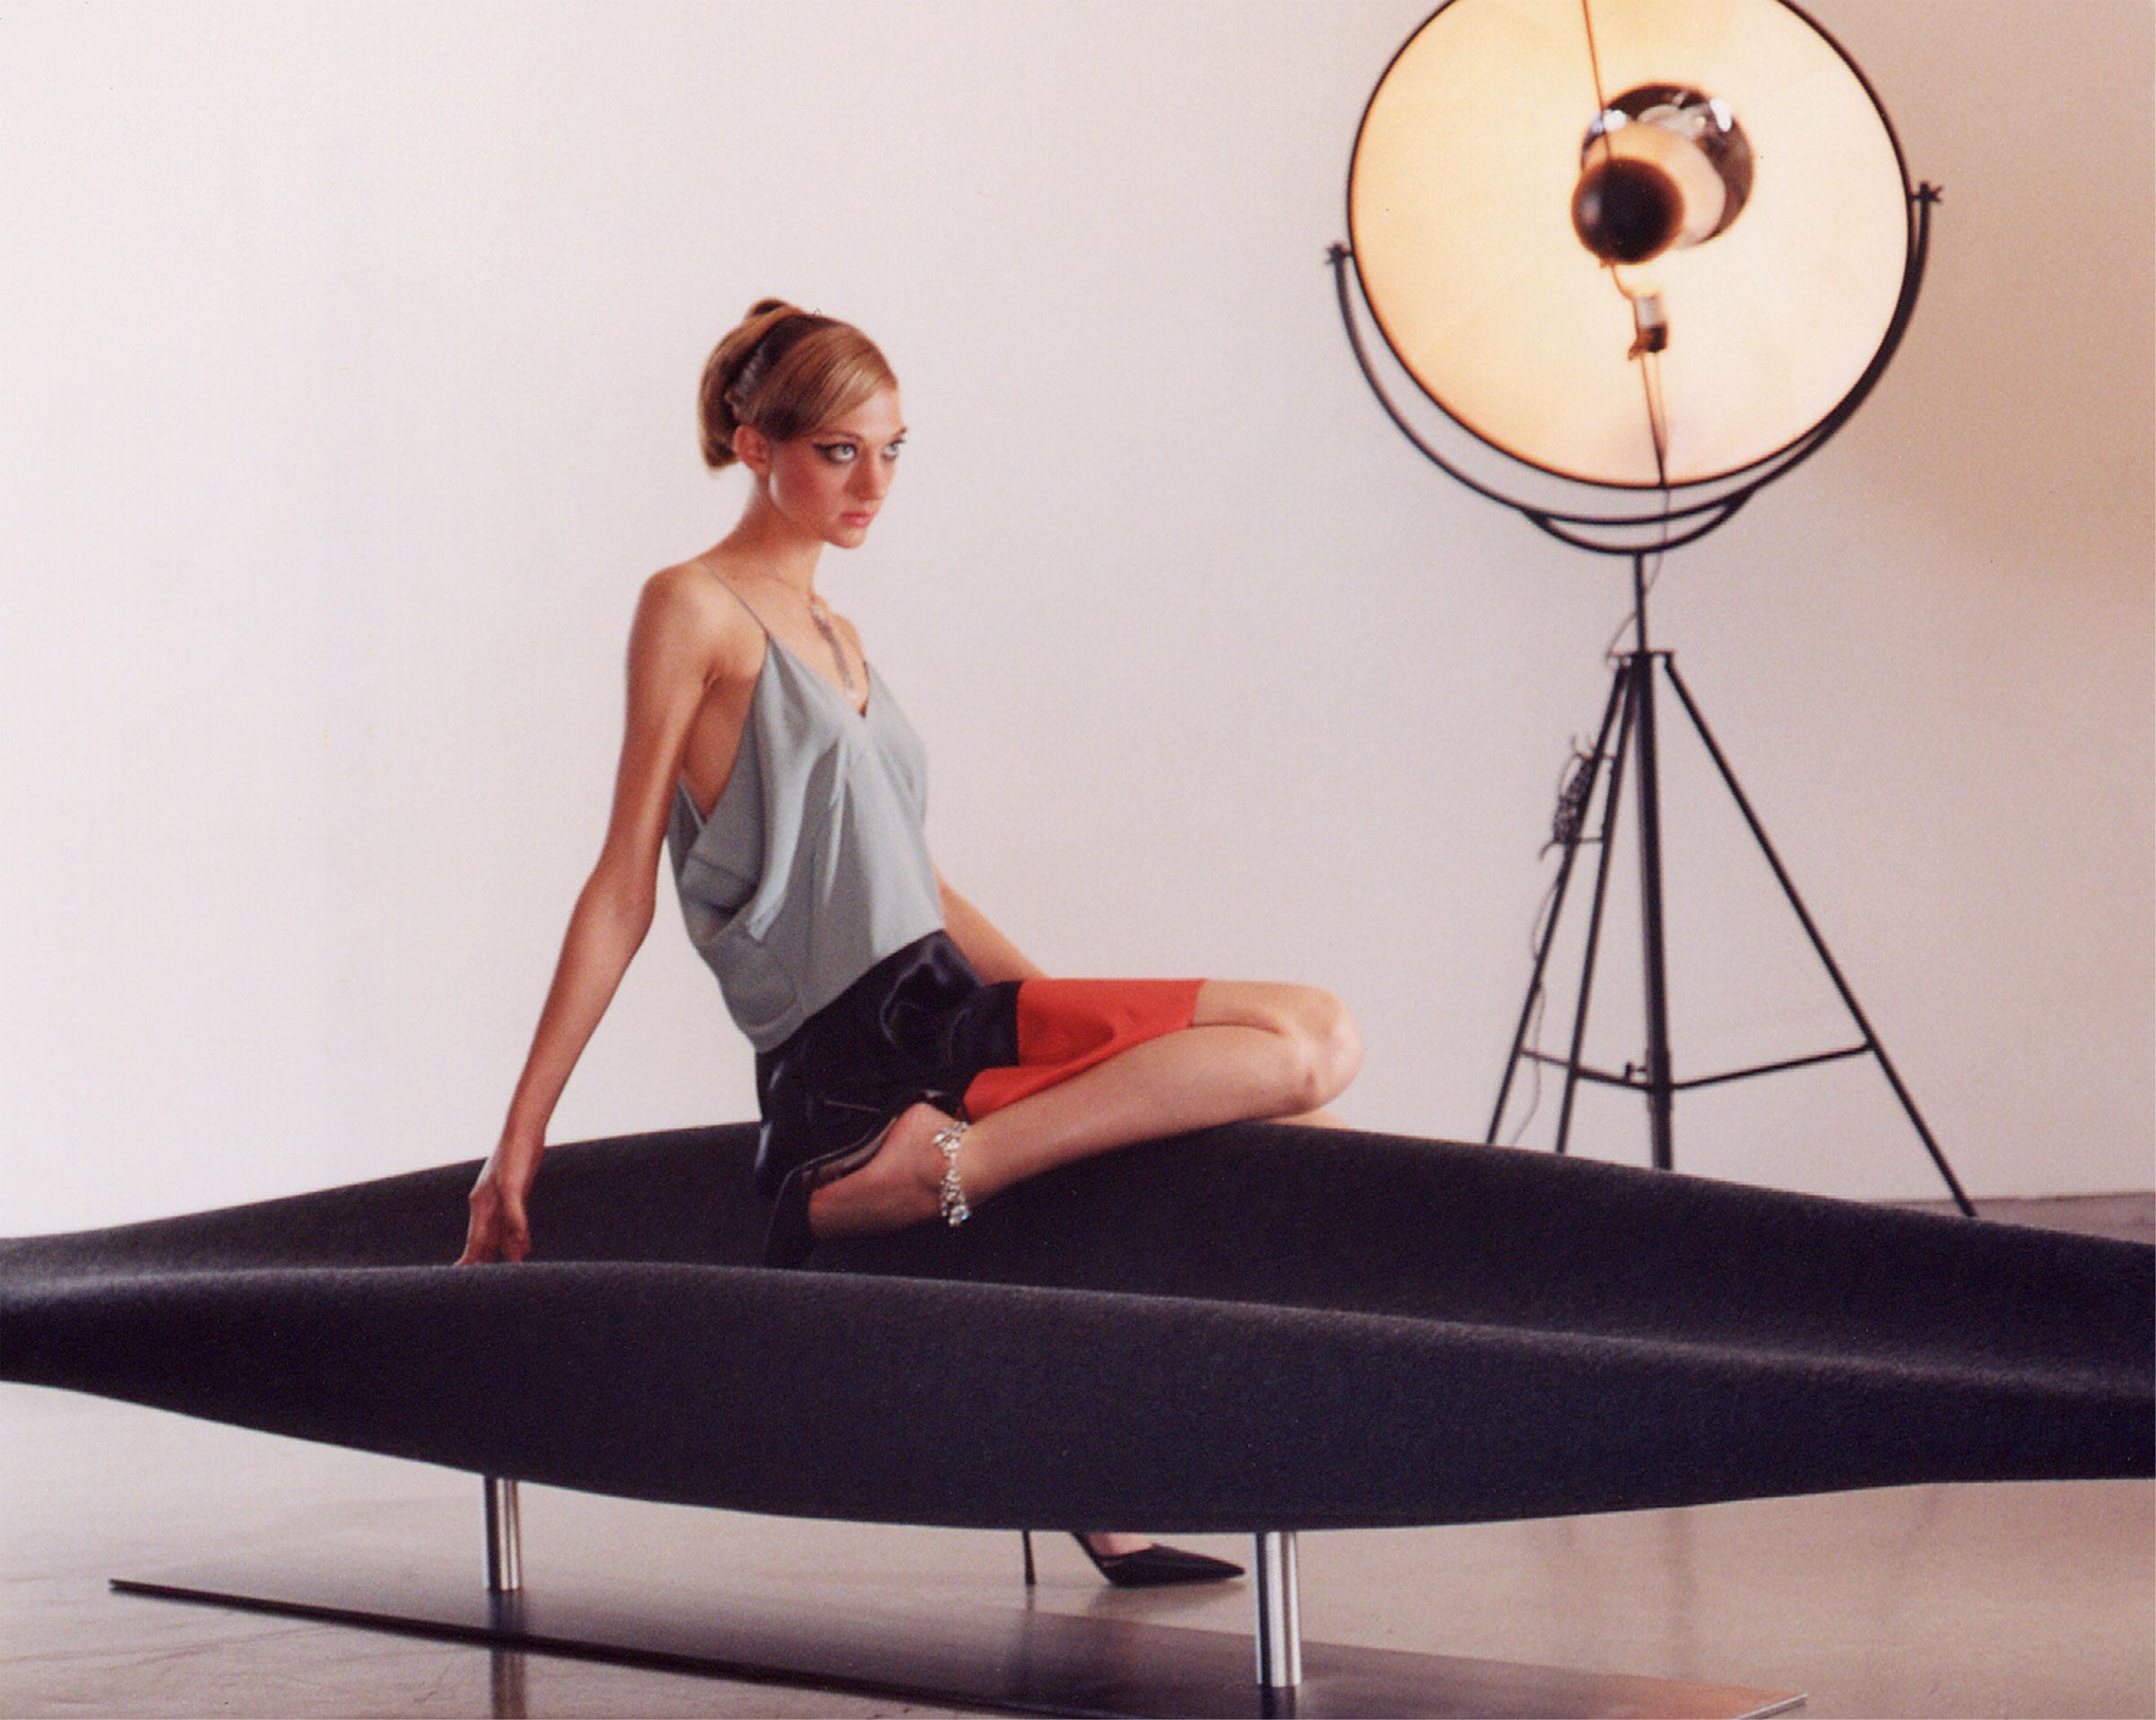 Mageina Tovah for Flaunt Magazine